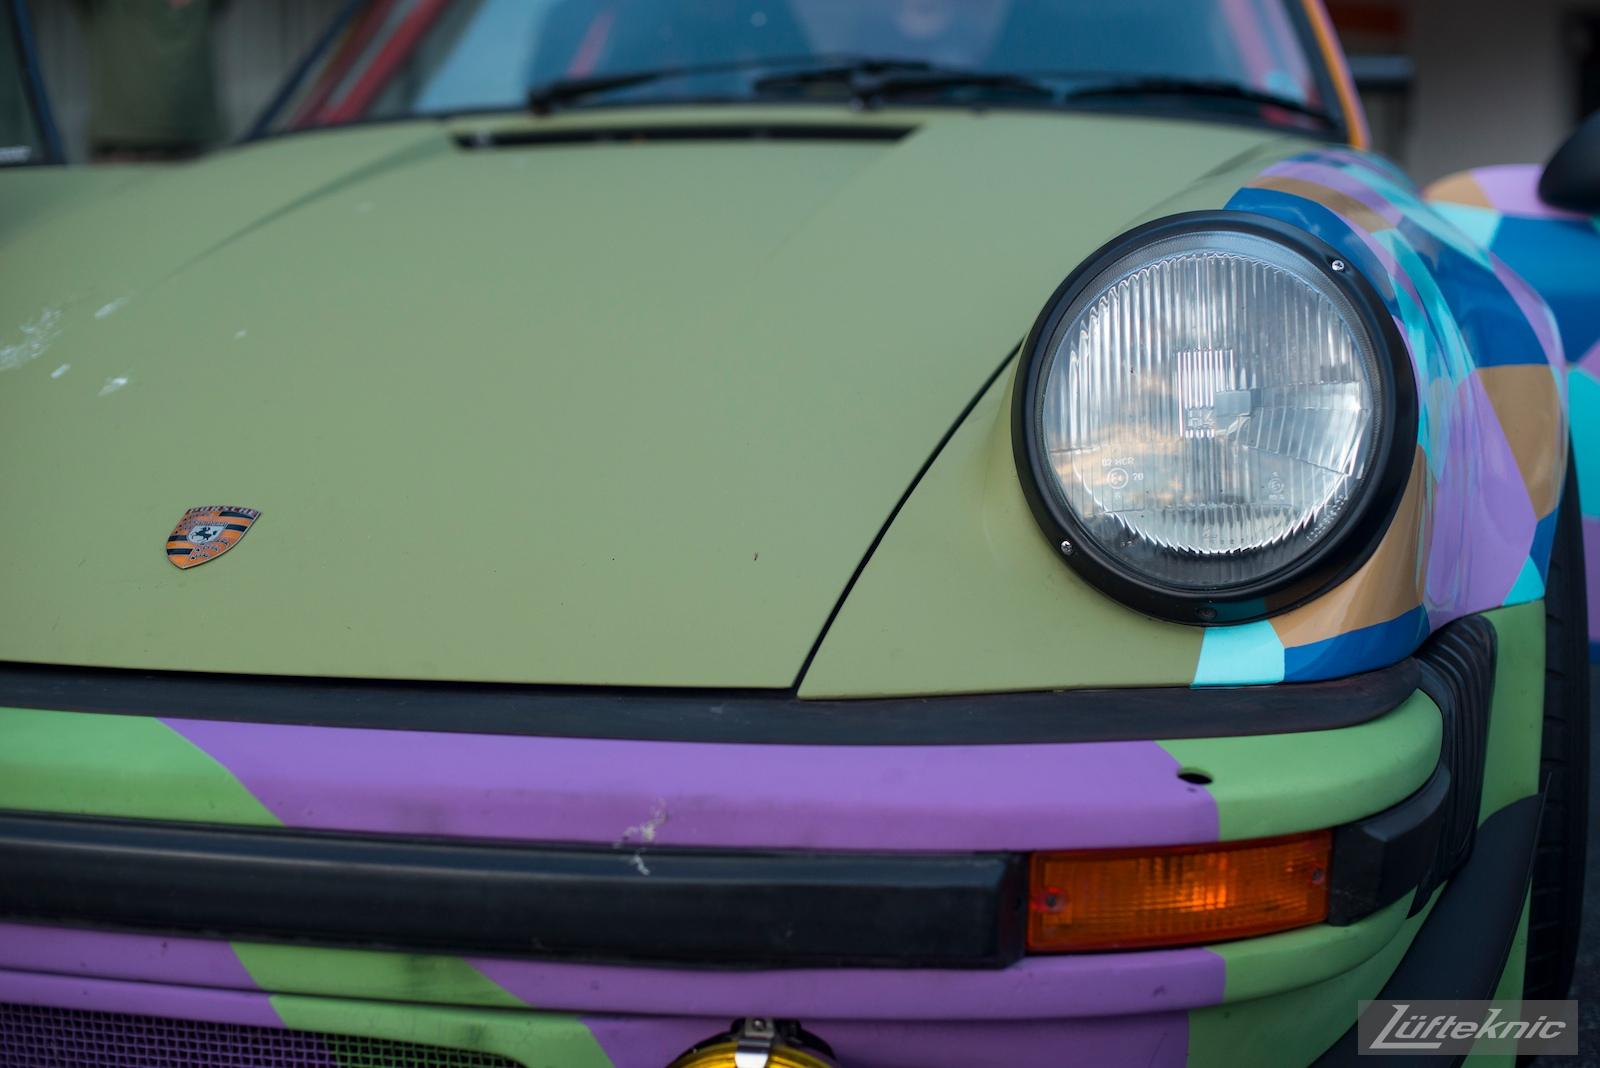 Lüfteknic #projectstuka Porsche 930 Turbo front end close up